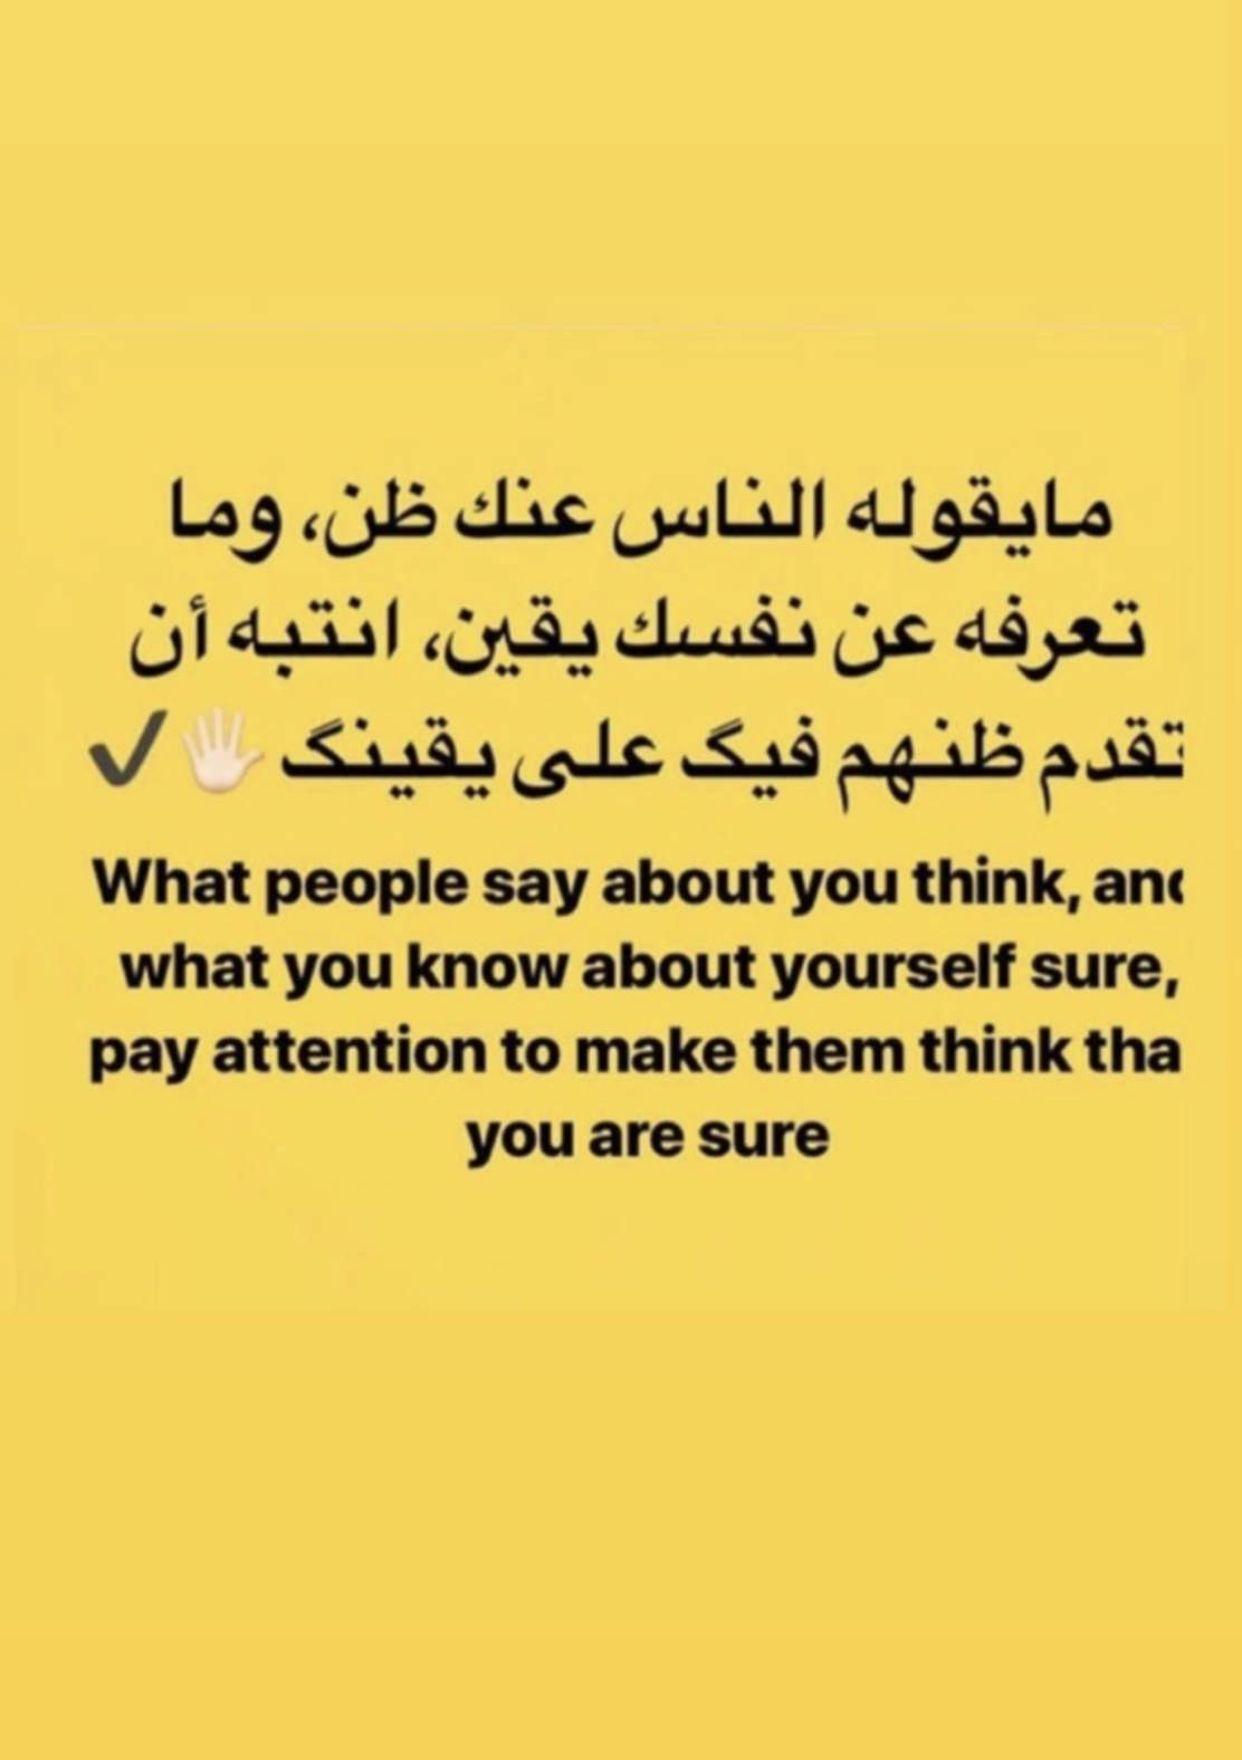 Epingle Par خليفه Sur كلمات